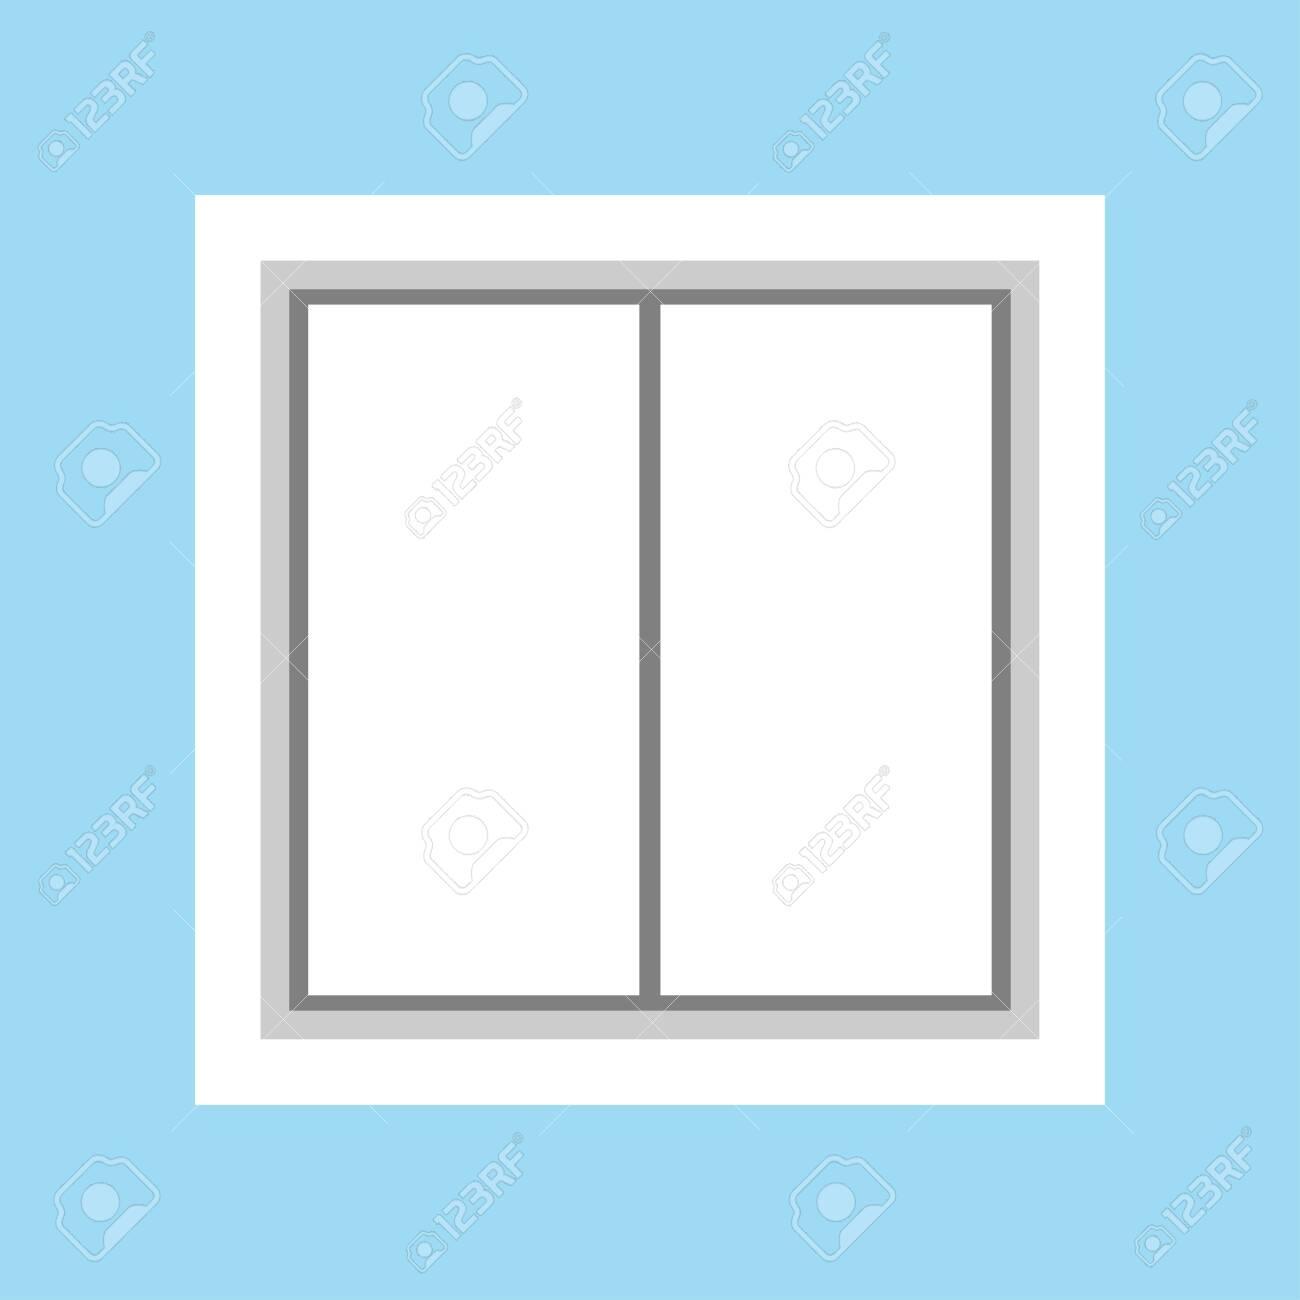 telephone symbol, temperature indicator symbol, fuse symbol, instrument cluster symbol, light fixture symbols, flood light symbol, generator symbol, sprinkler head symbol, potentiometer symbol, light language symbols, energy symbol, capacitor symbol, light off symbol, led light symbol, tail light symbol, power jack symbol, fog light symbol, light sweet crude symbol, on light switch symbol